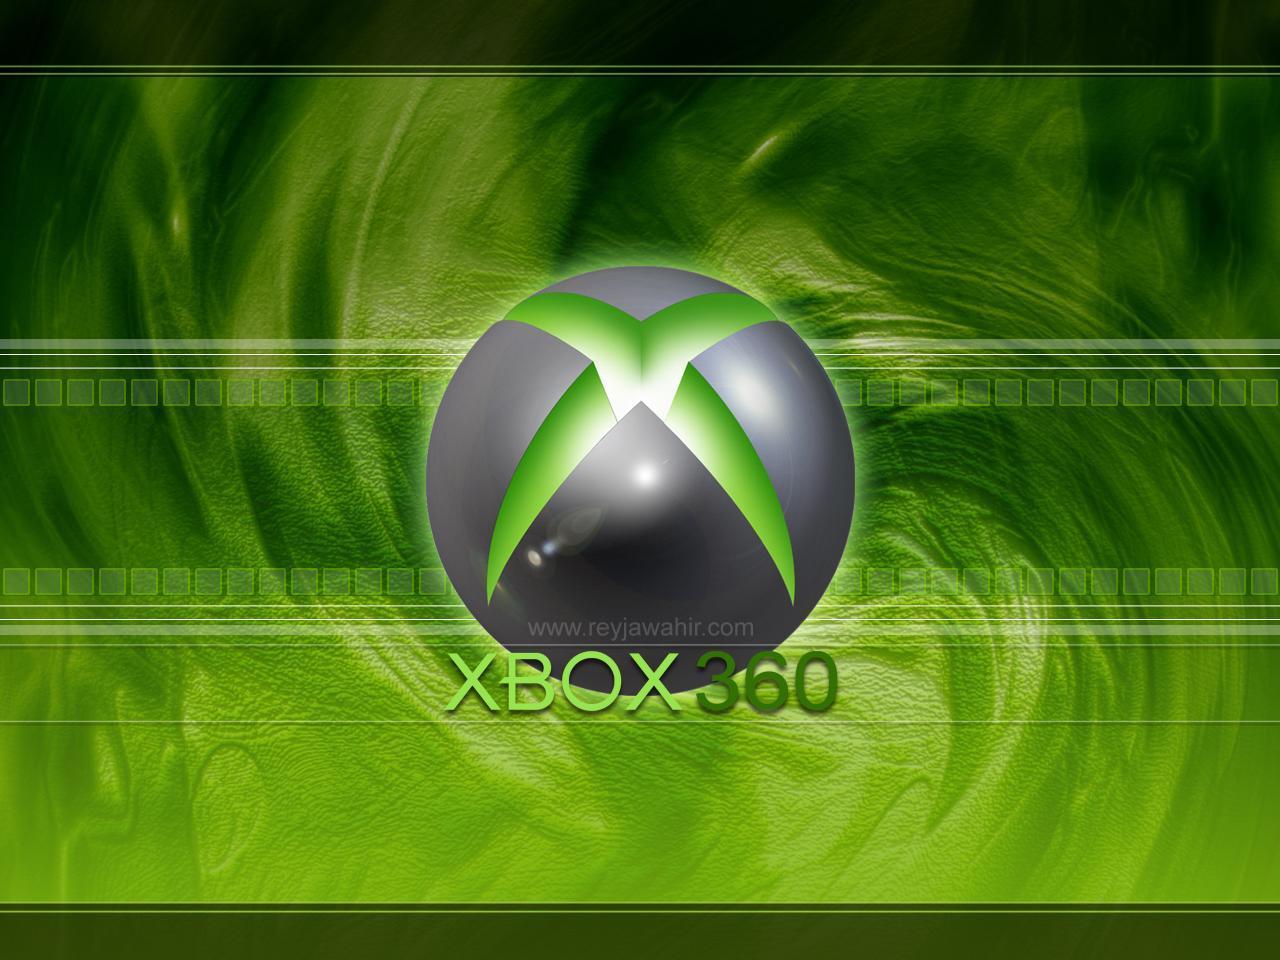 xbox 360 wallpaper hd agustus 2011 wallpaper xbox controller xbox 360 1280x960